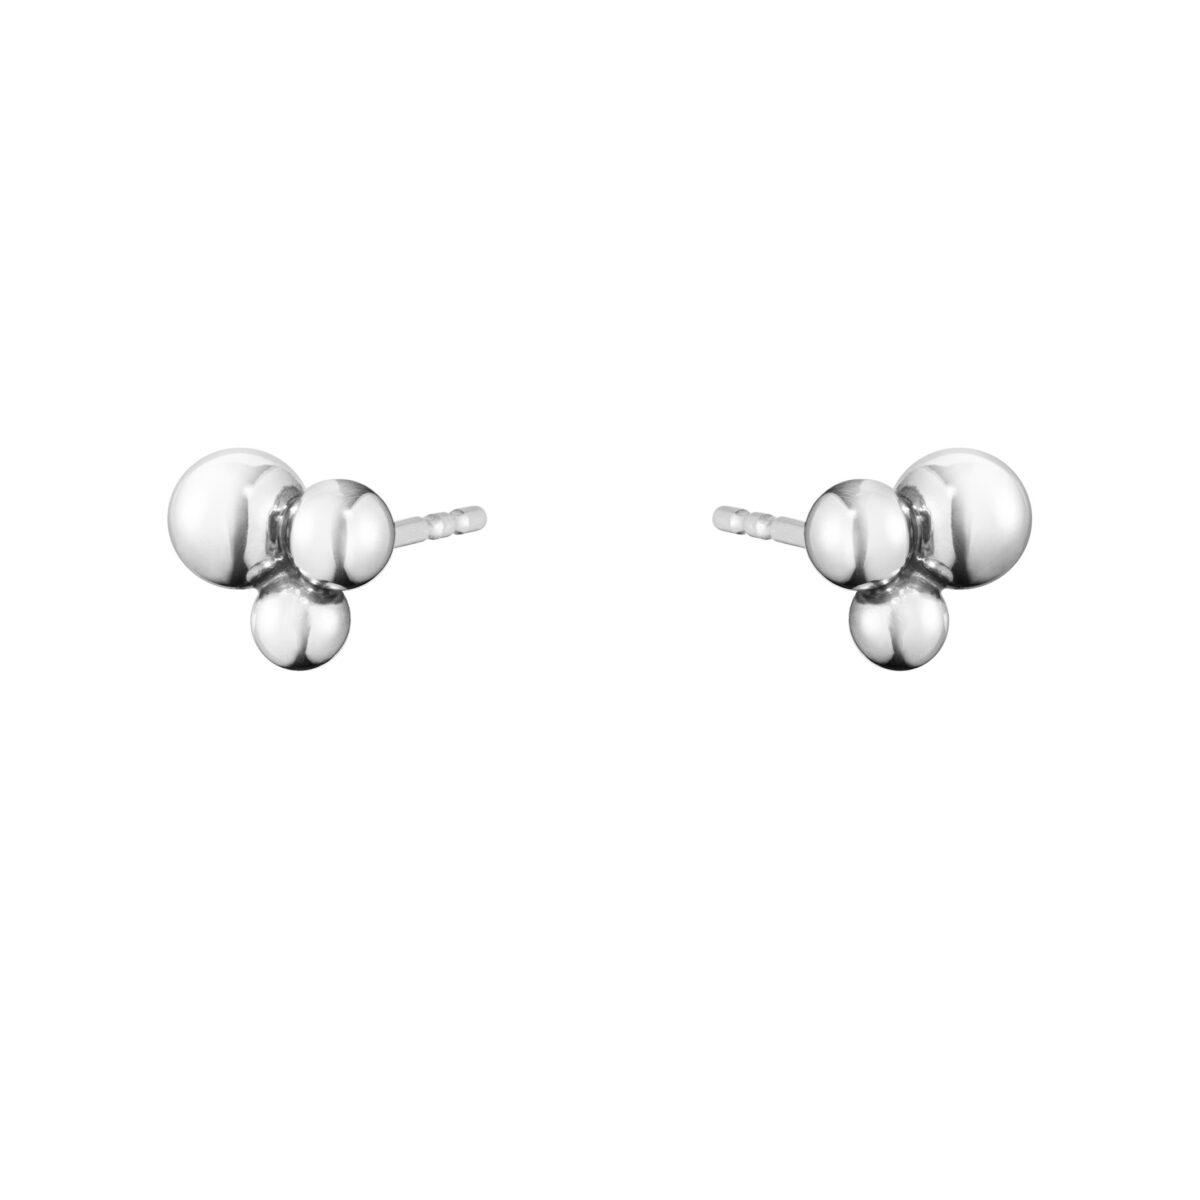 Georg Jensen Moonlight Grapes Stud Earrings